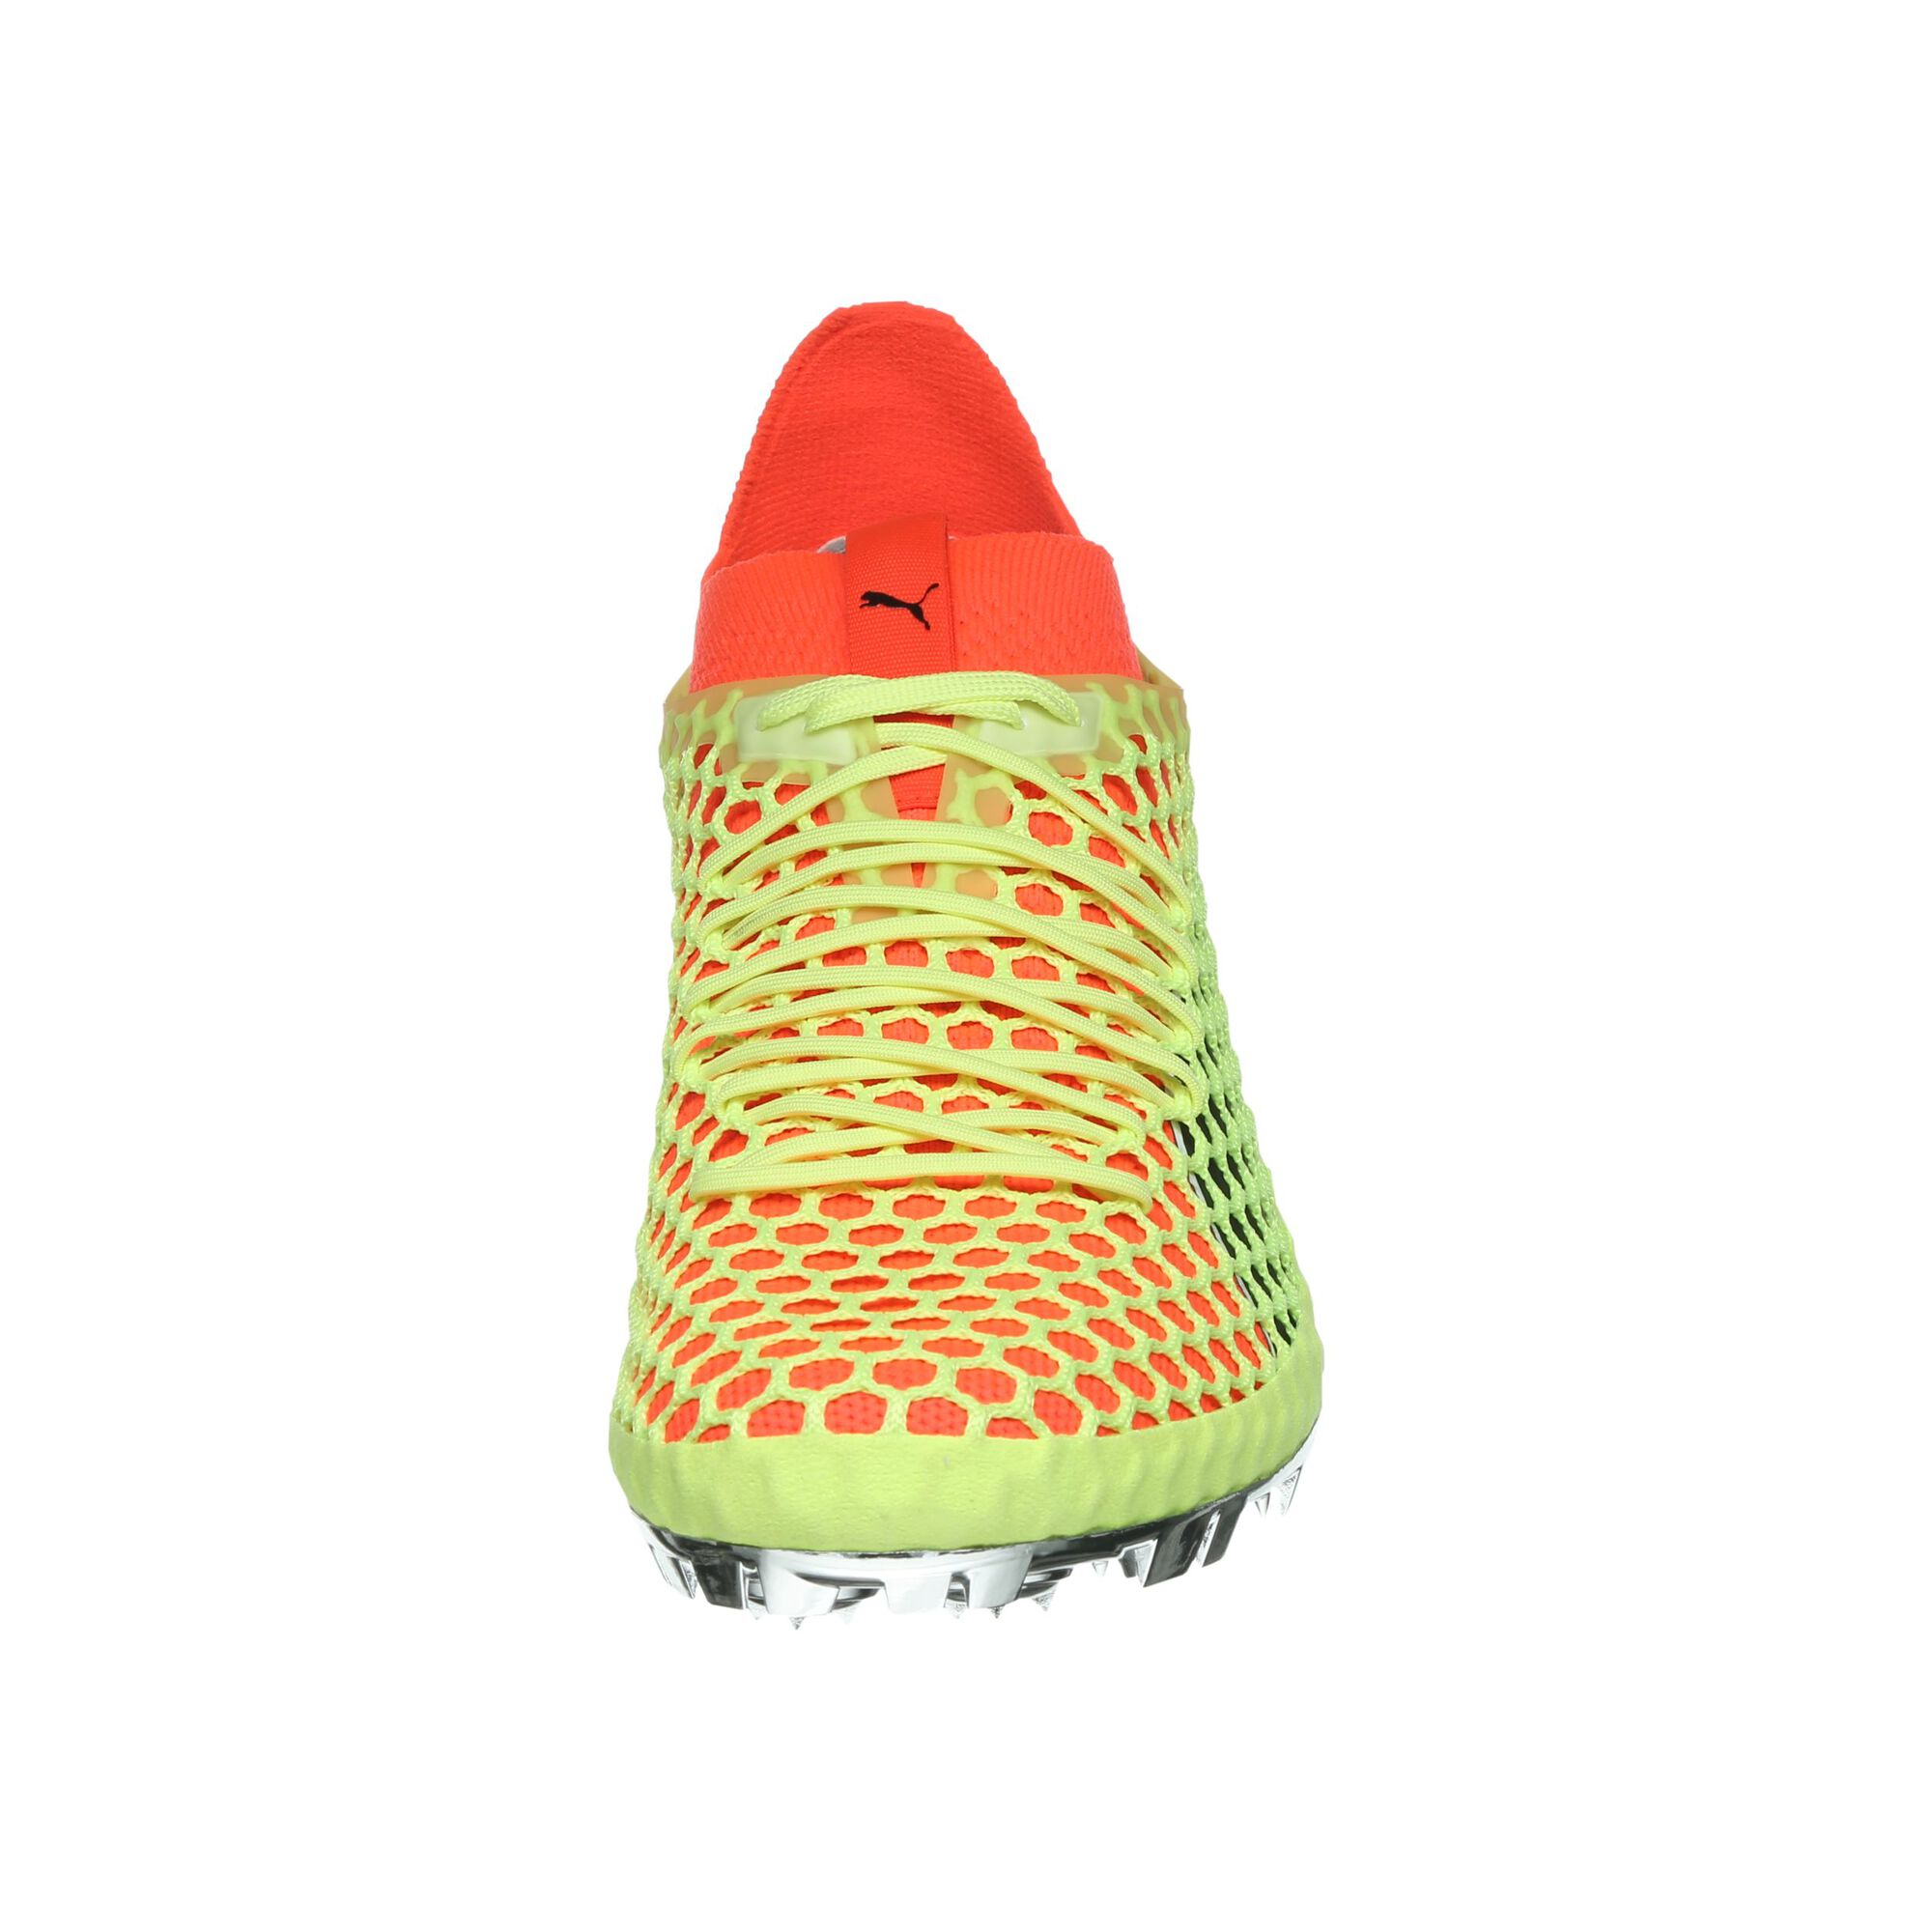 9cdc17c875e buy Puma EvoSPEED NETFIT Sprint Spike Shoes Men - Neon Yellow ...